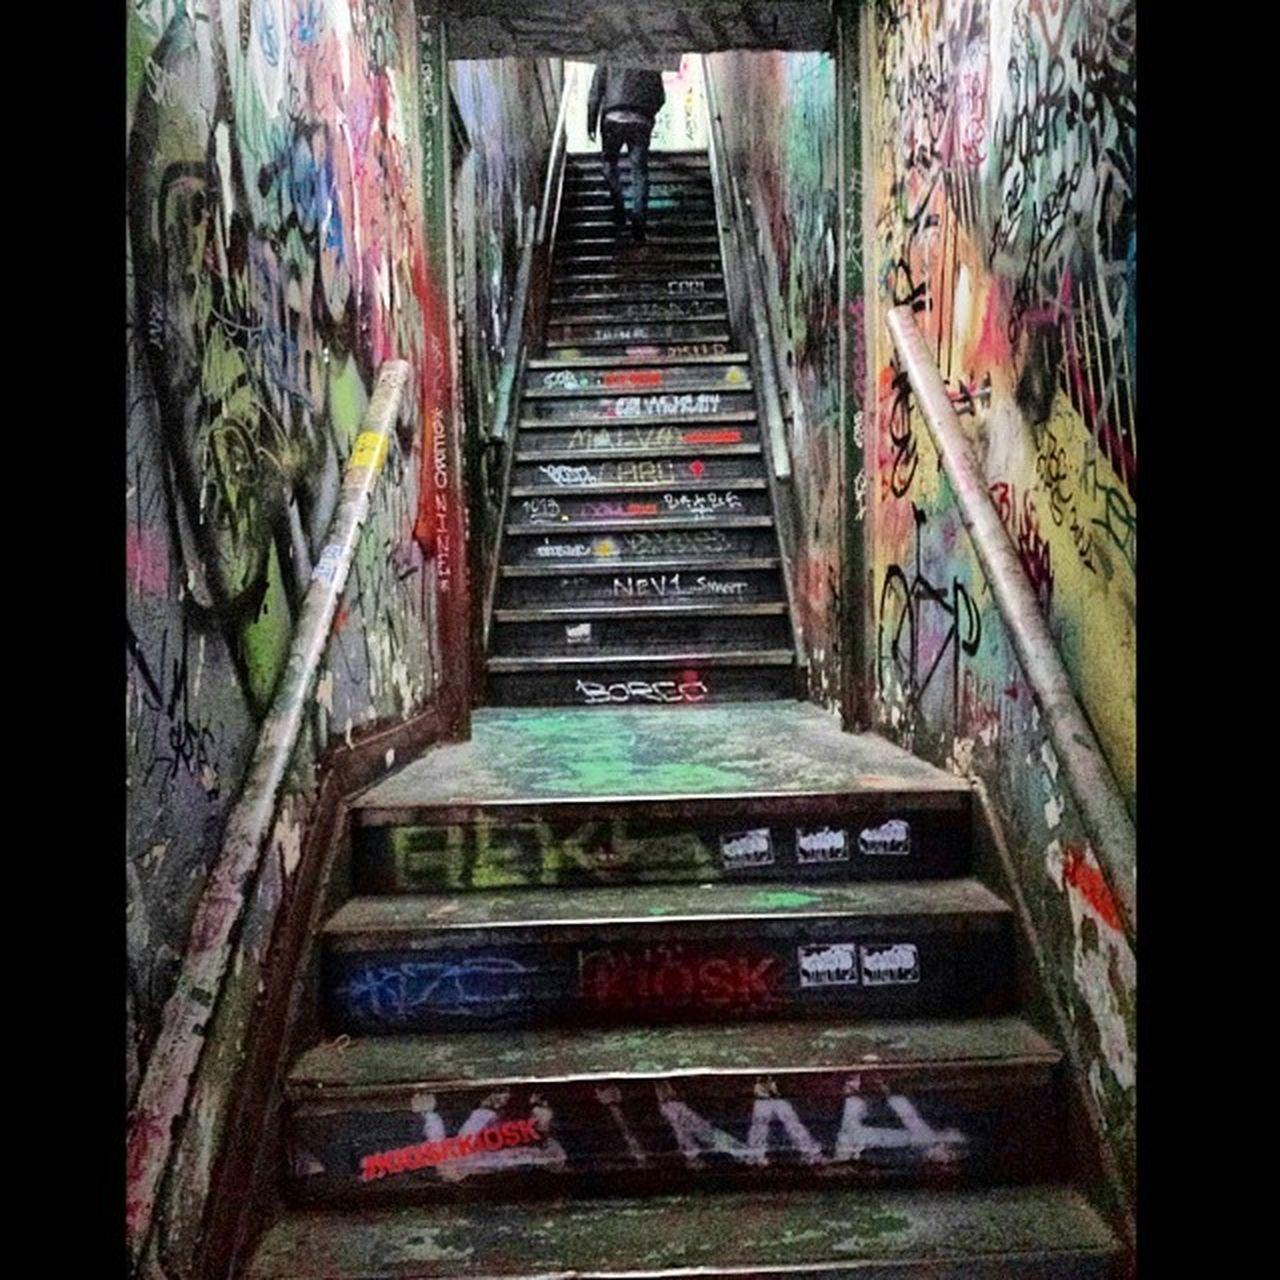 Stairway at 95 Spring Street . Photo by EpoK 95SpringStreet Manhattan NYC Taggin Graffiti Art stairwaytoheaven graffitibombing